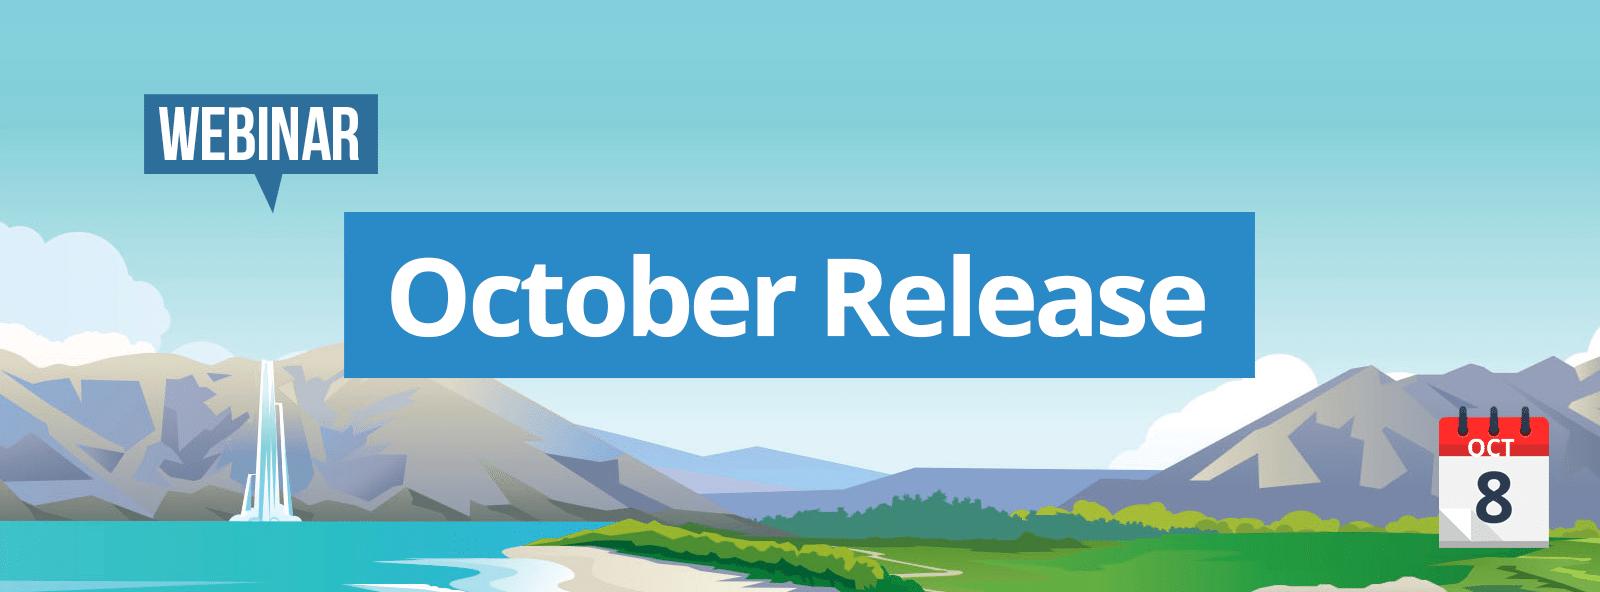 Webinar October Release Netive VMS